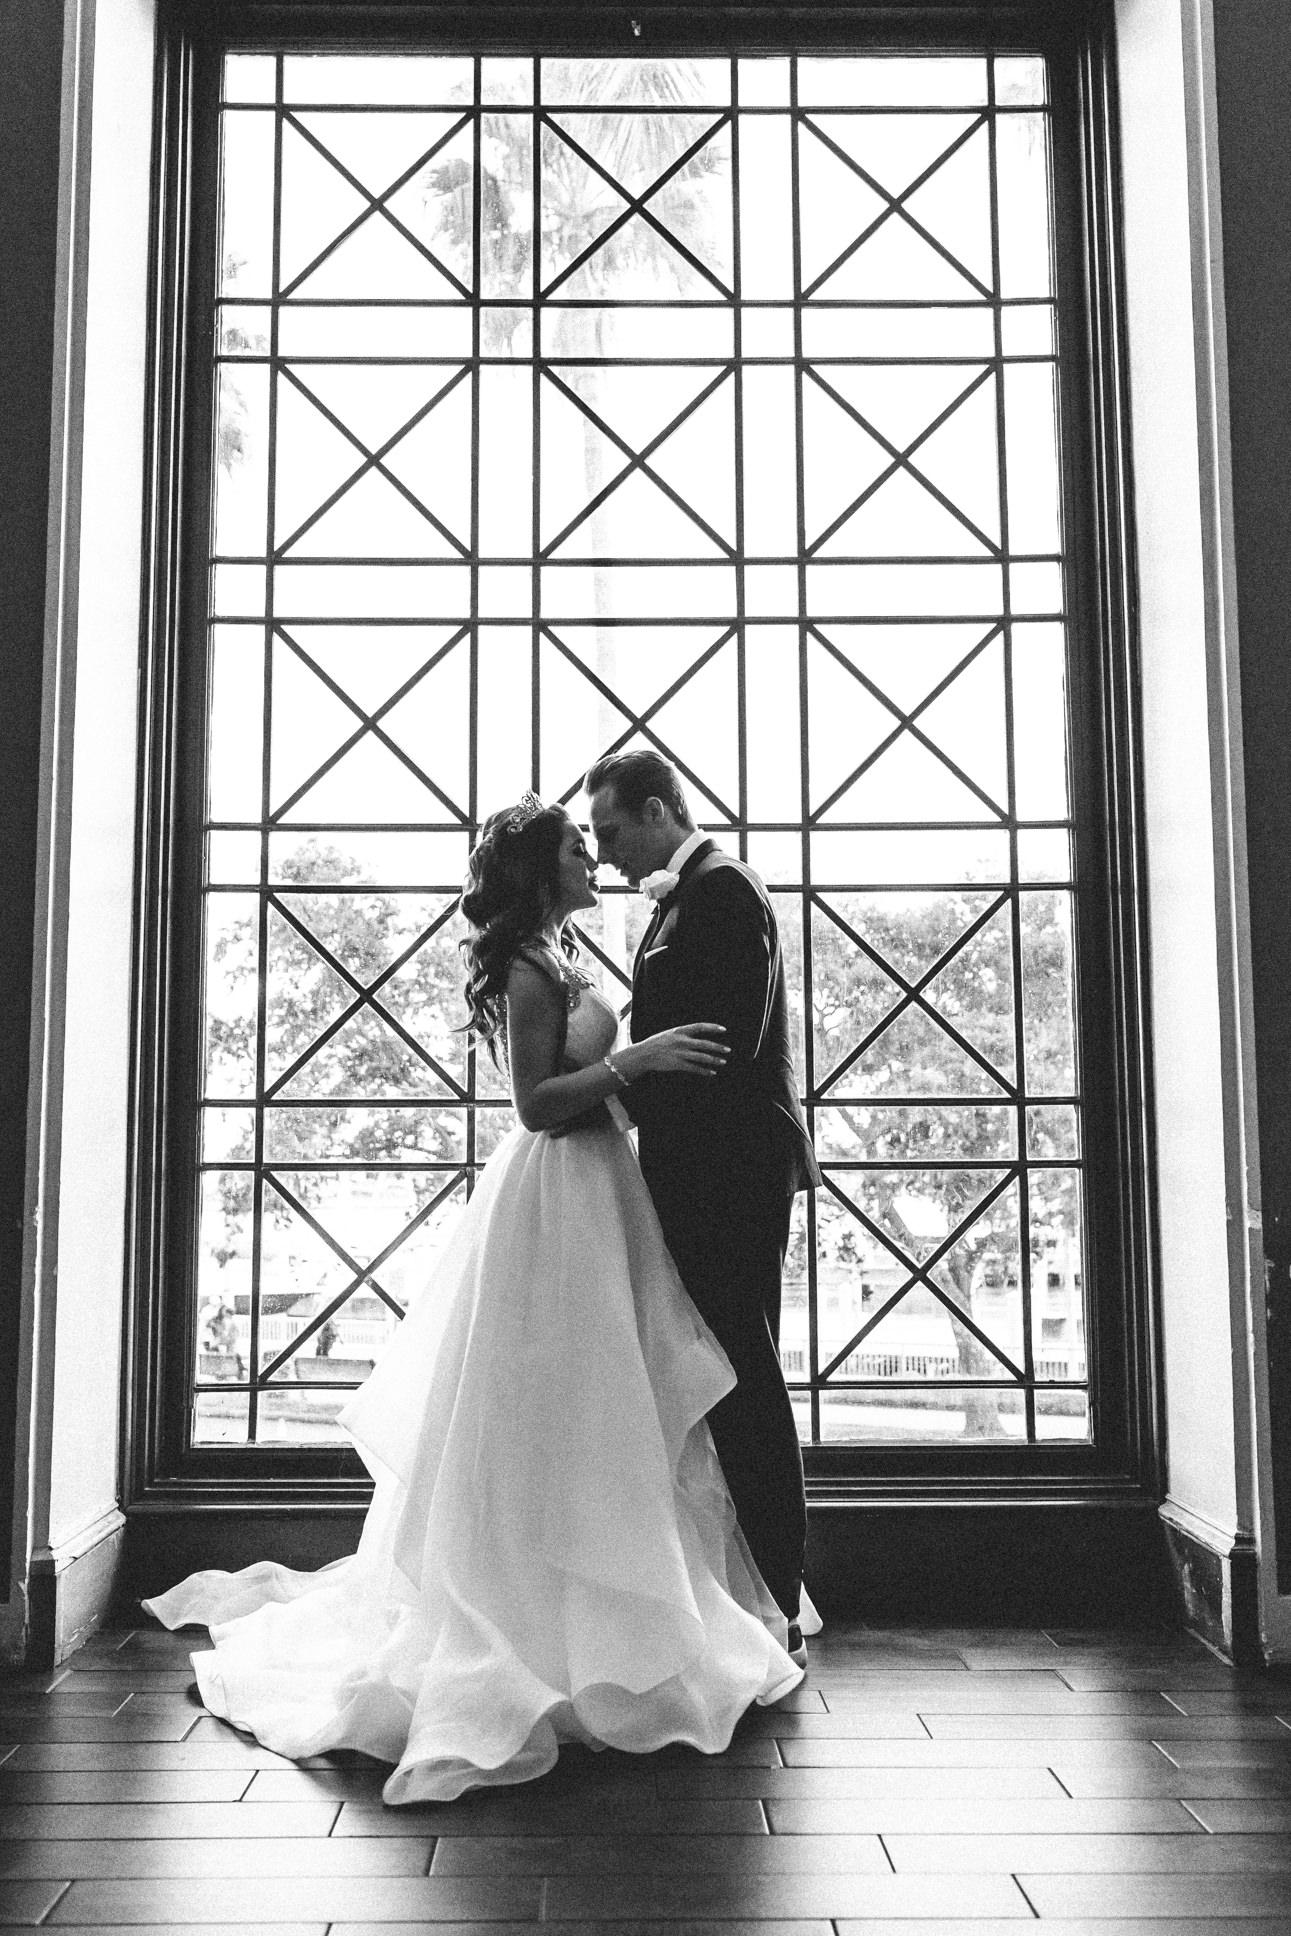 Romantic Black and White Bride and Groom Wedding Portrait   Tropical, Florida Resort Waterfront Wedding Venue   The Vinoy Renaissance St. Petersburg Resort & Golf Club